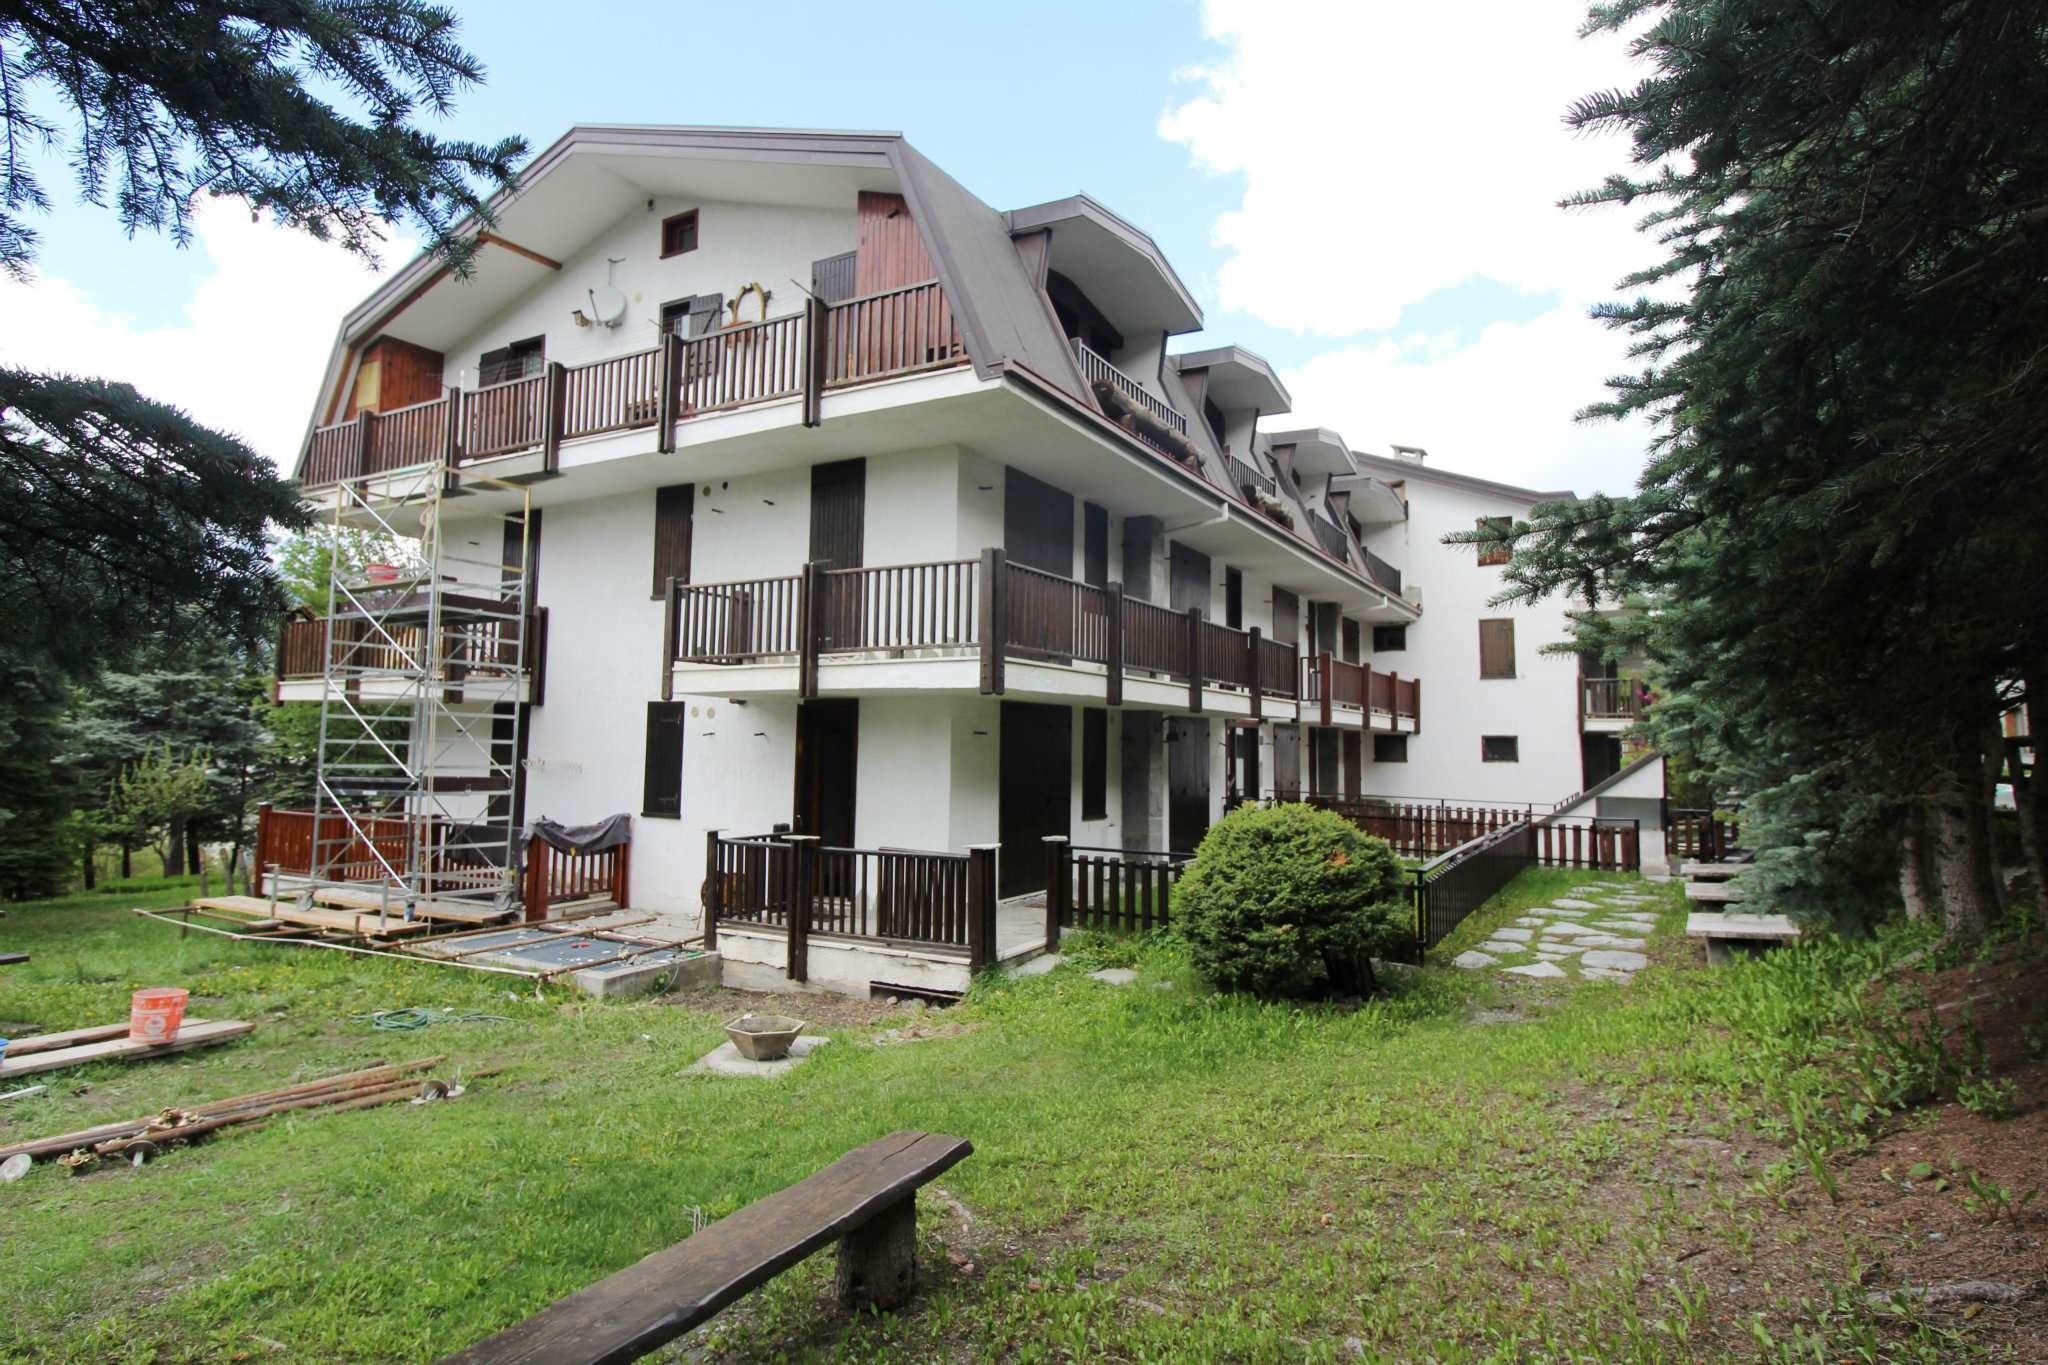 Appartamento in vendita via Oulx 133 Sauze d'Oulx